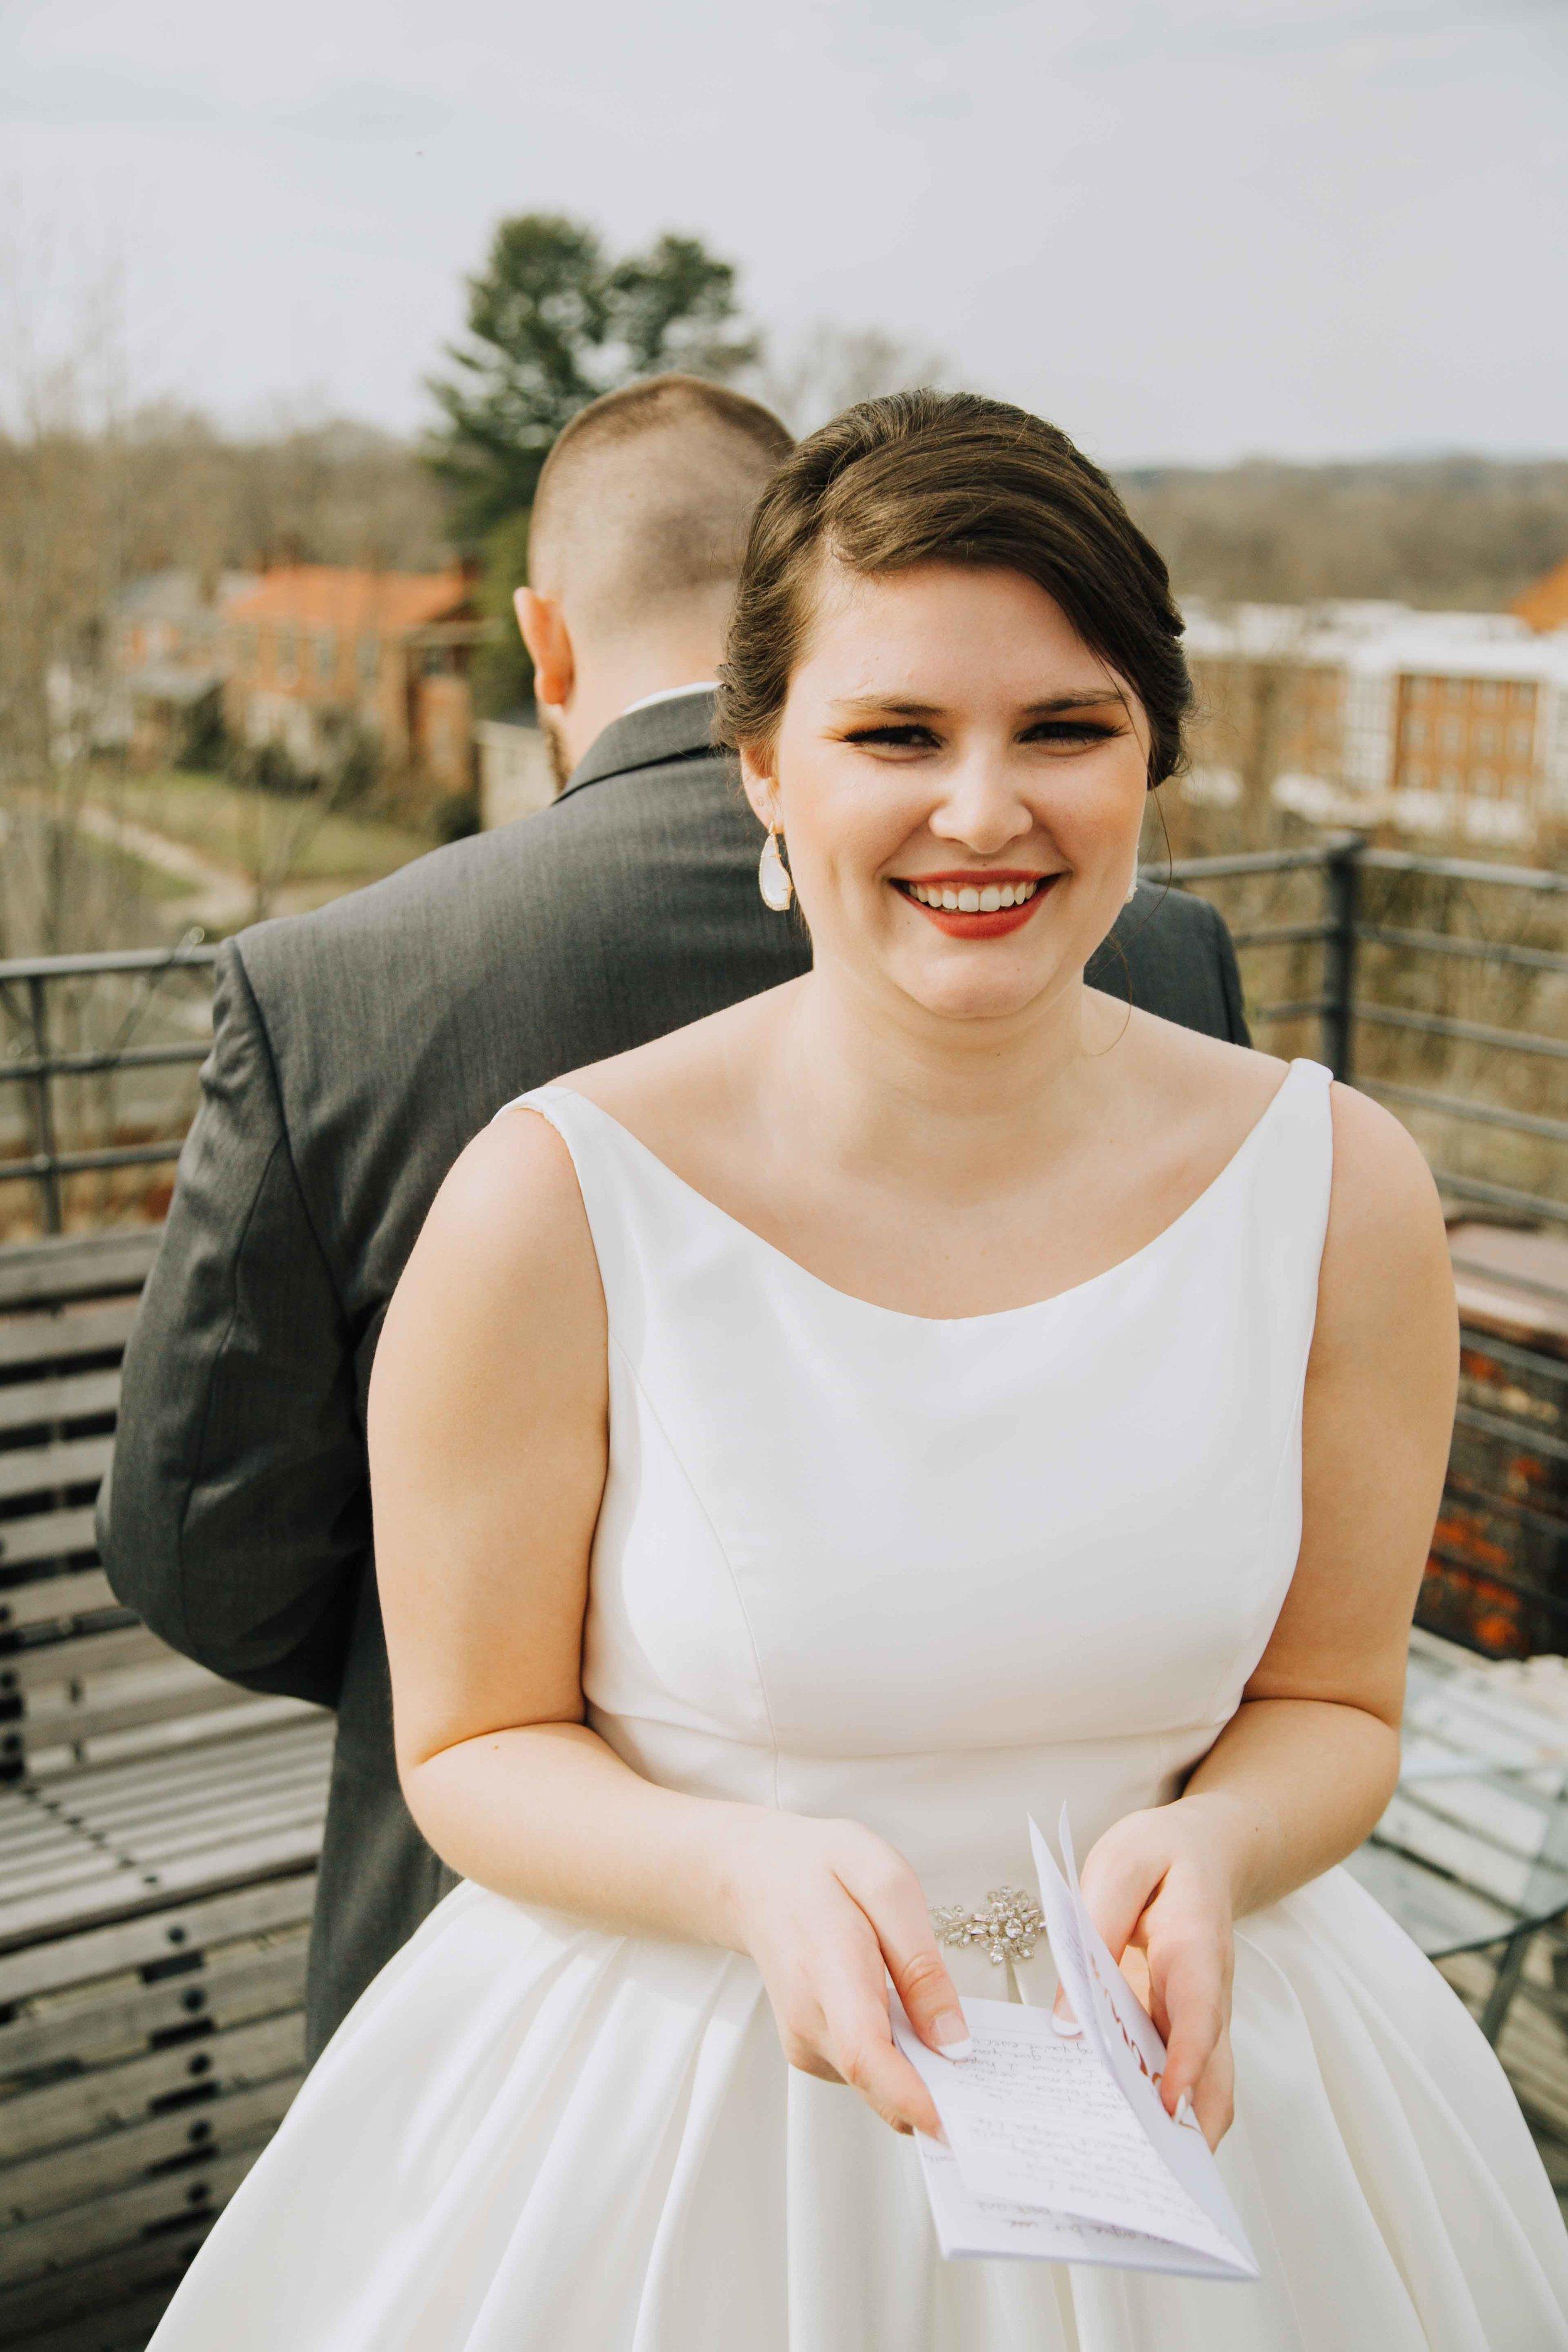 Farmville-Virginia-Wedding-Hotel-Weynoke-Downtown-Jacqueline-Waters-Photography-Detailed- (553).jpg